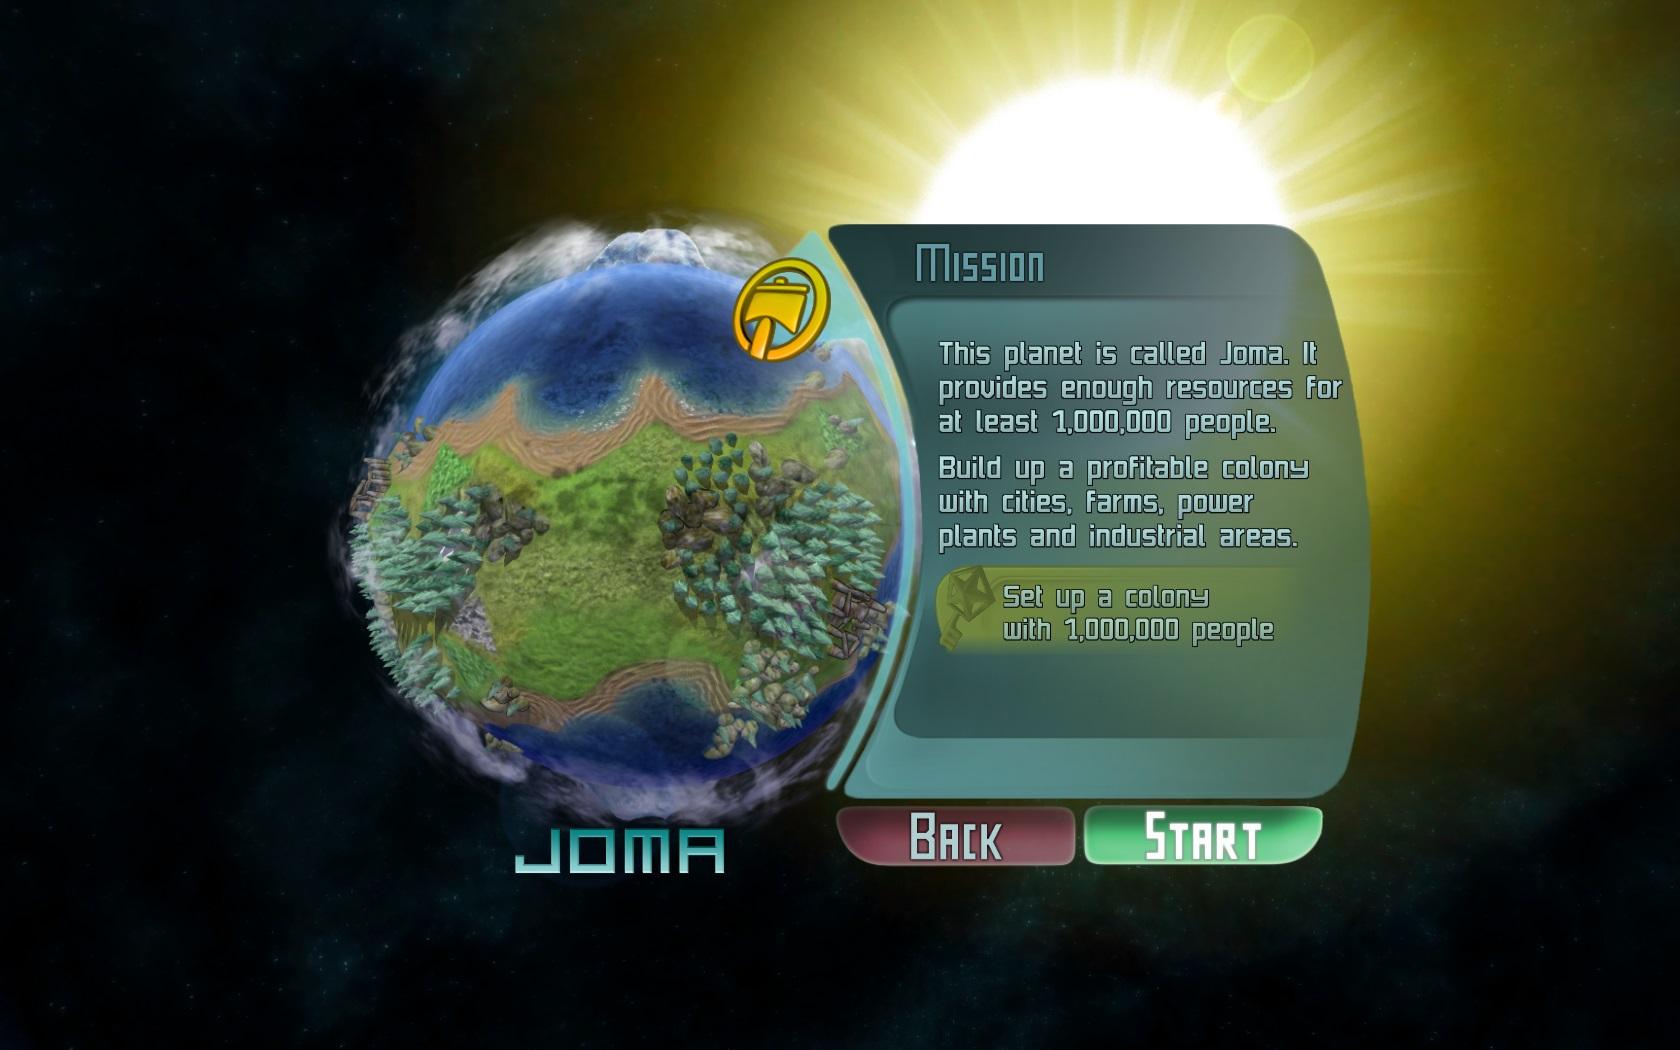 Joma Mission